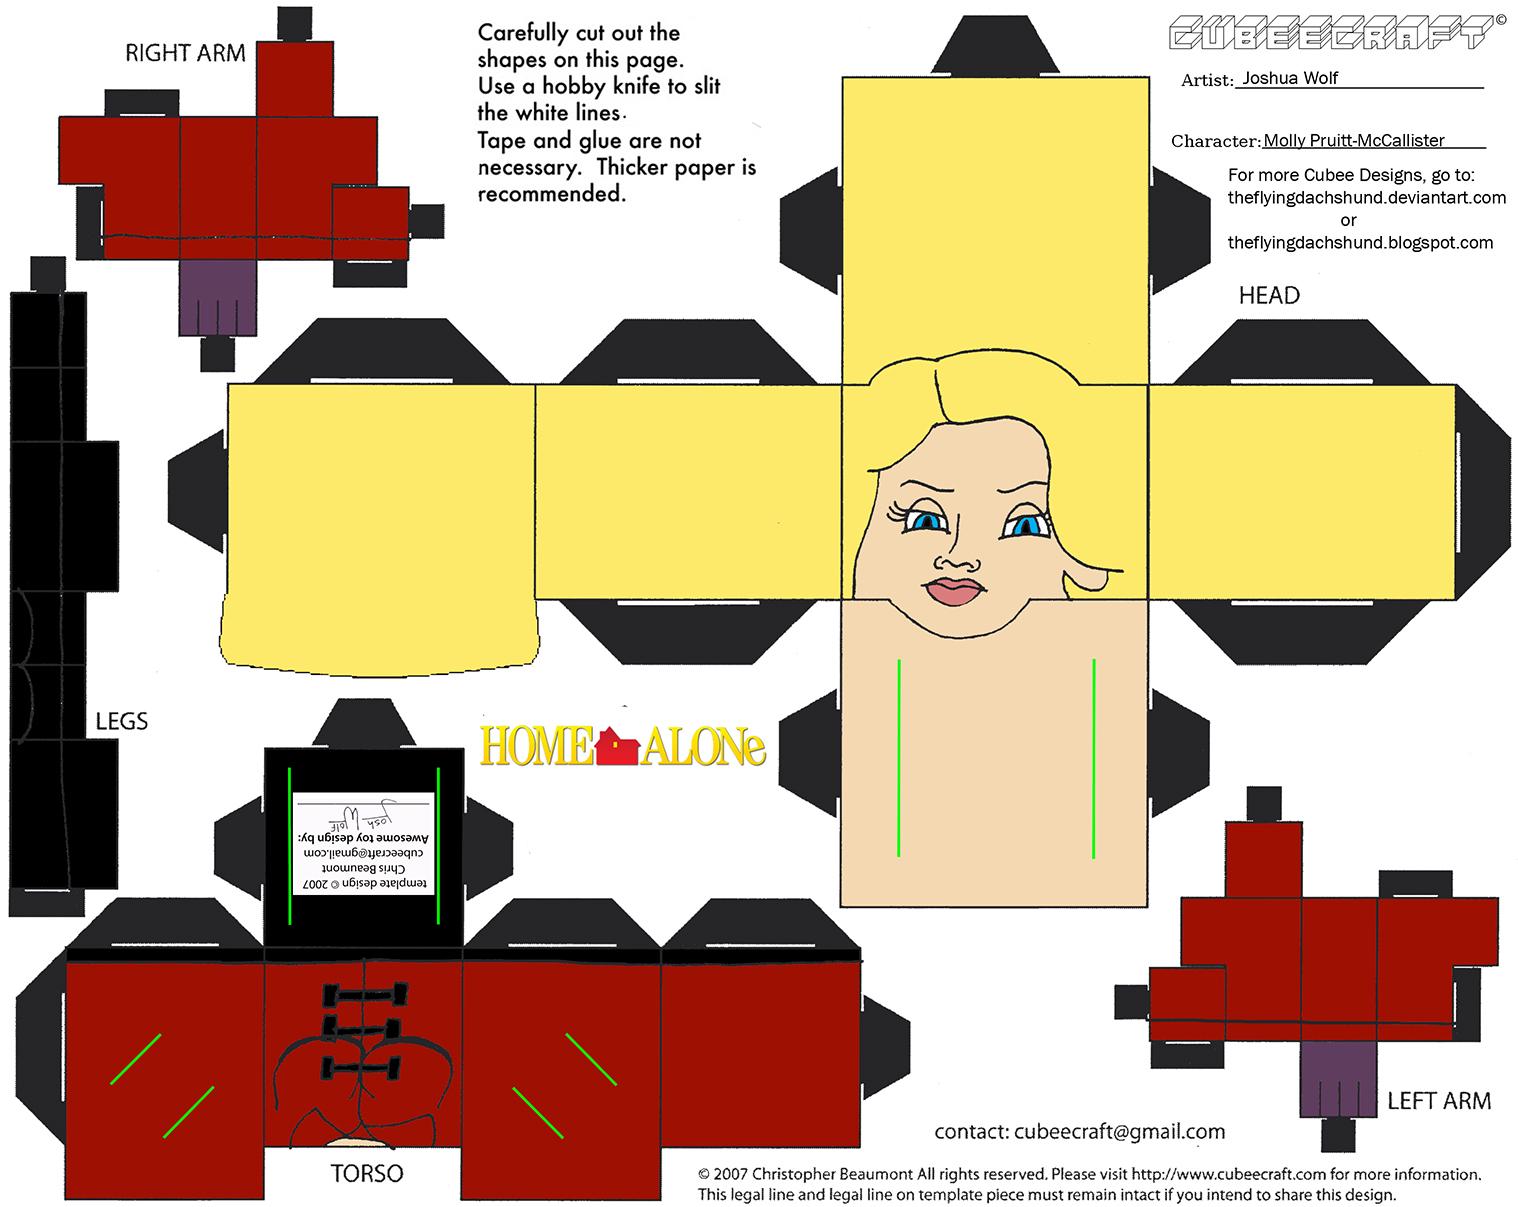 XMas12: Molly Pruitt-McCallister Cubee by TheFlyingDachshund